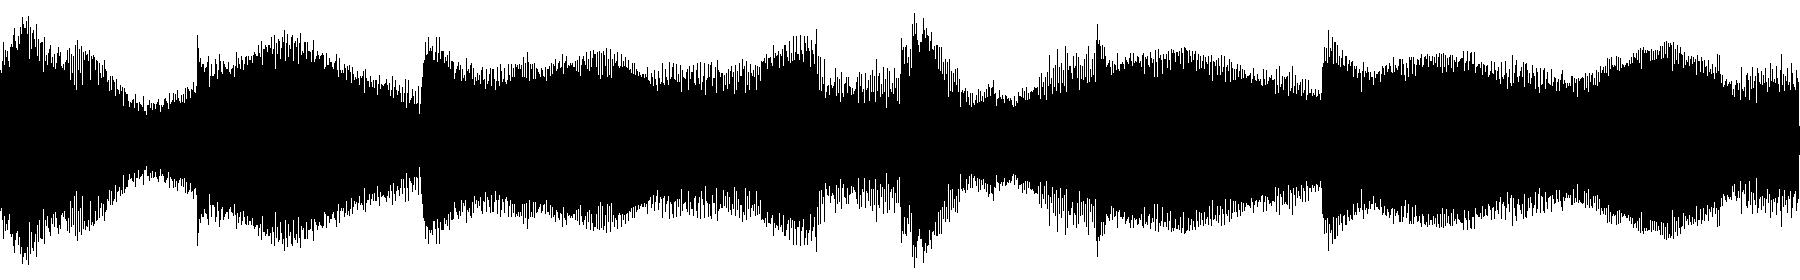 vedh melodyloop 076 amaj7 cm b 120bpm